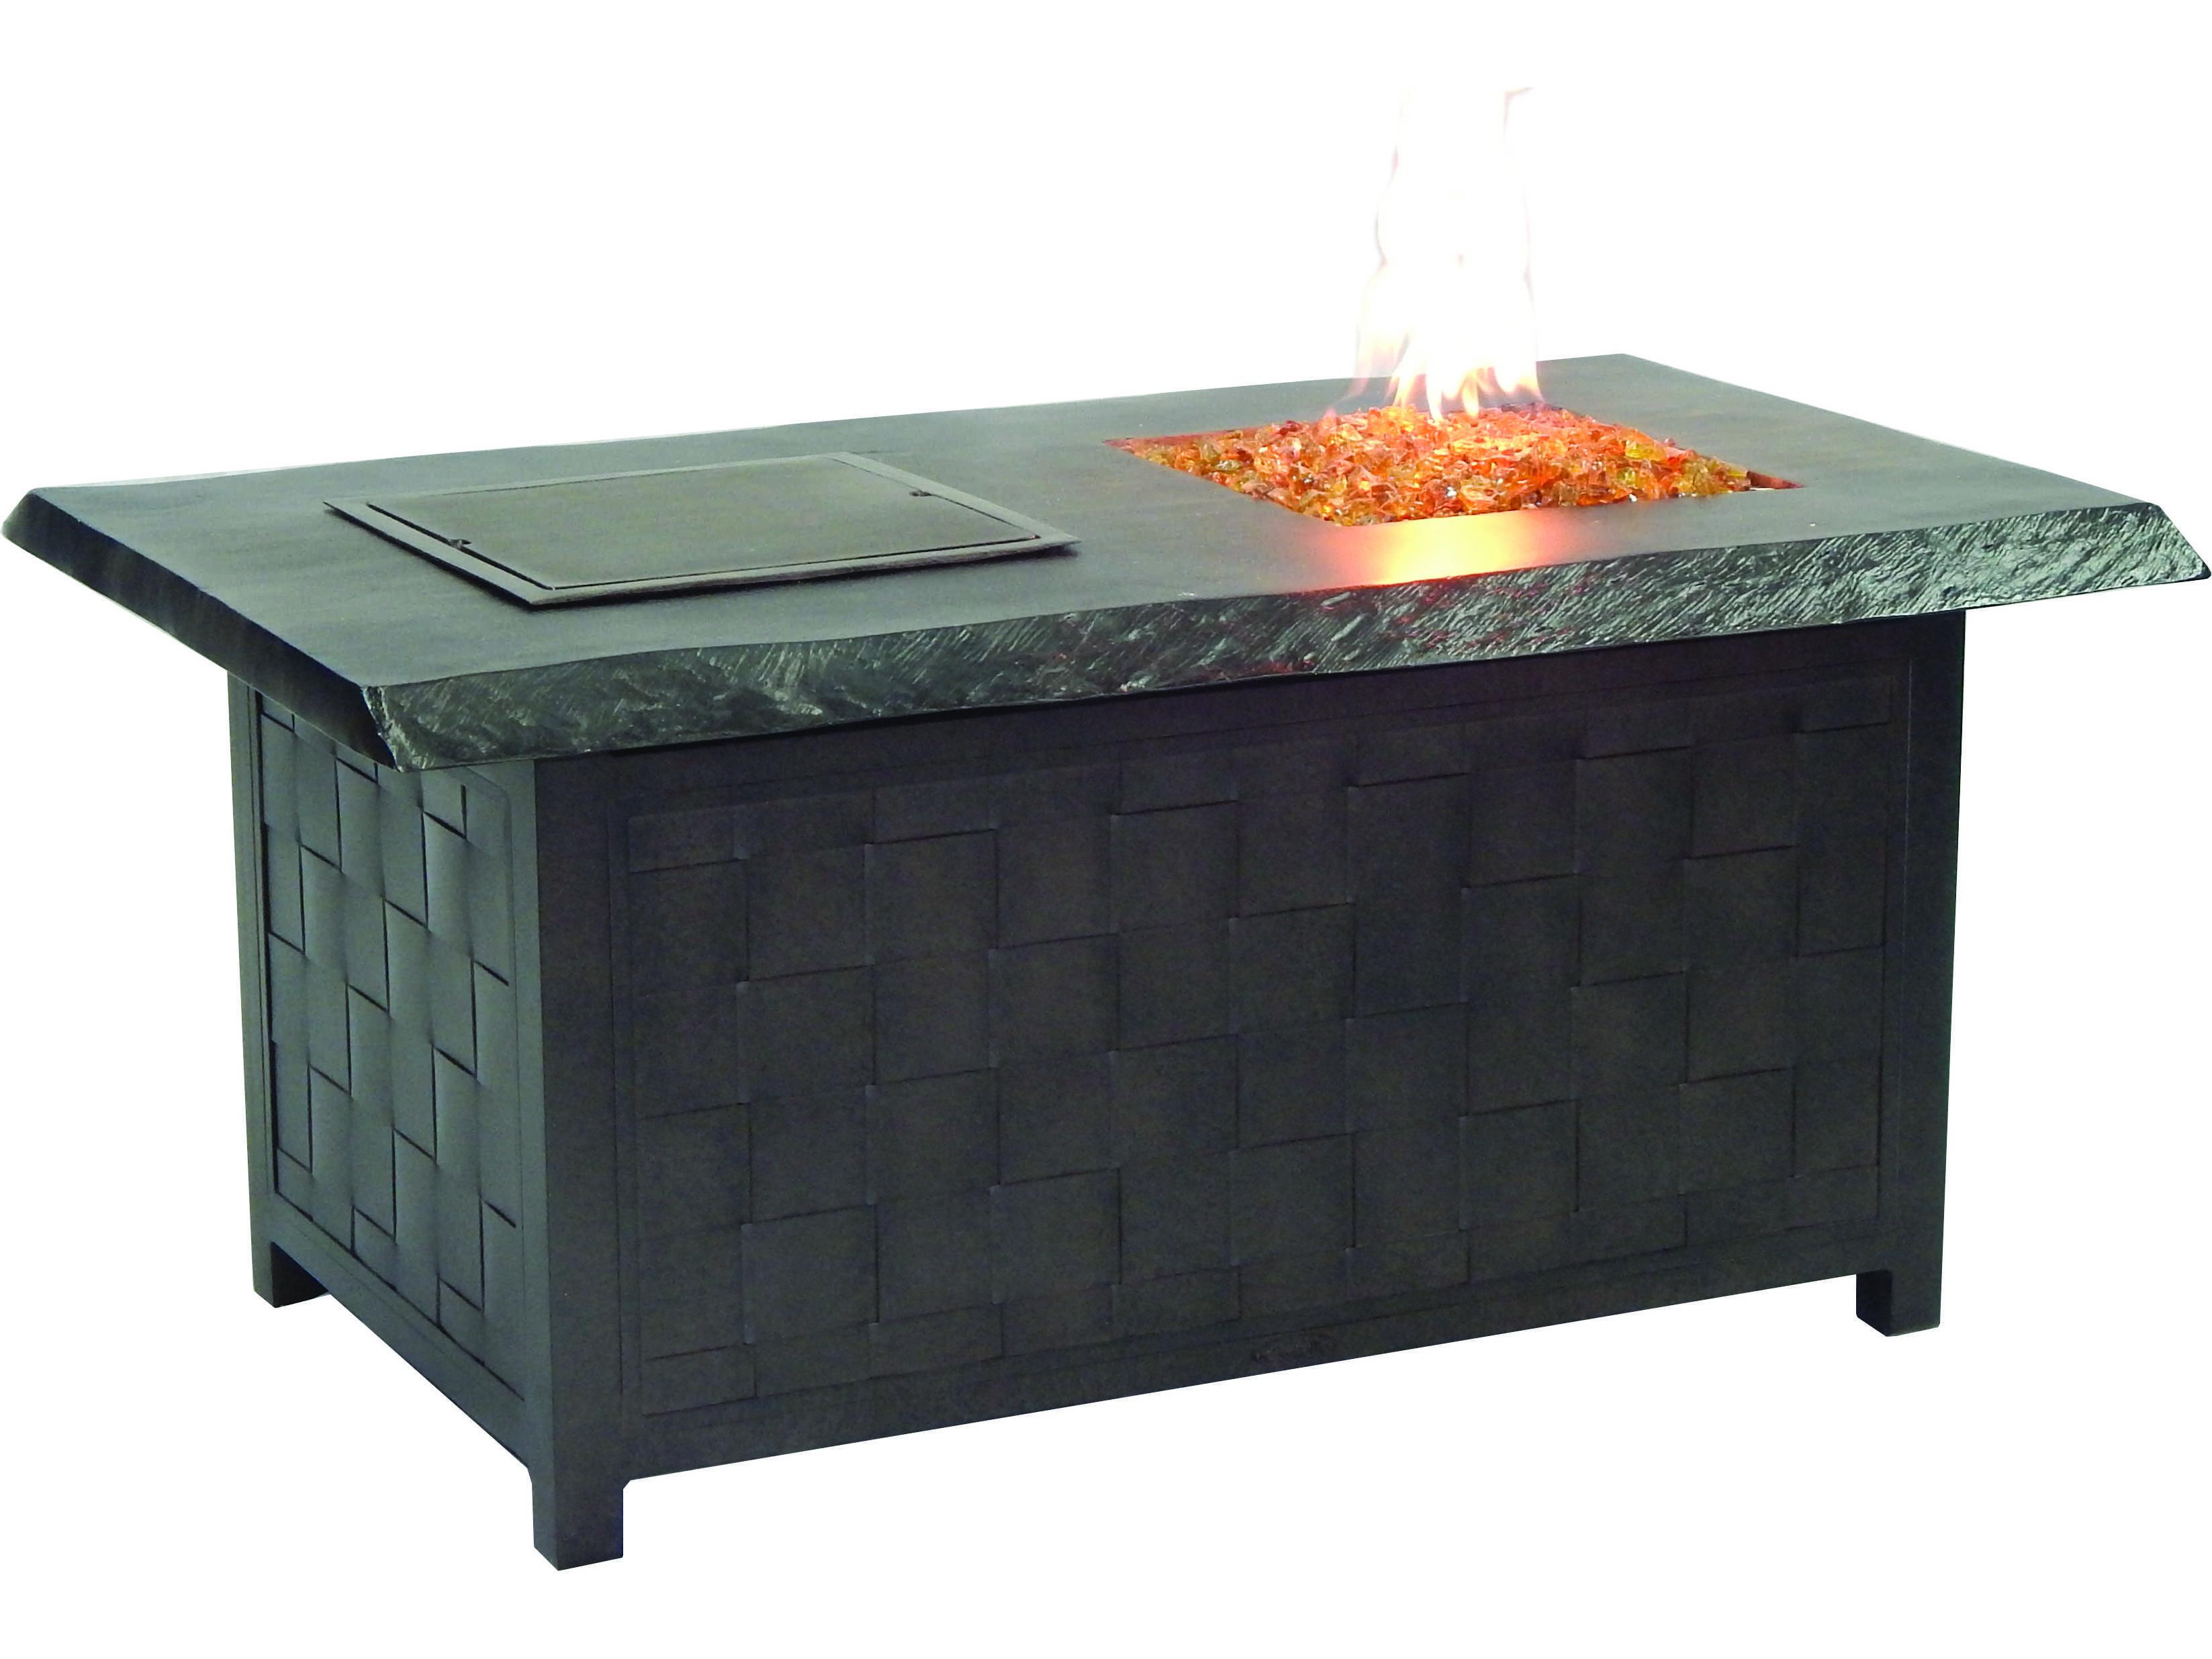 Castelle Classical Firepits Aluminum 52 X 36 Rectangular